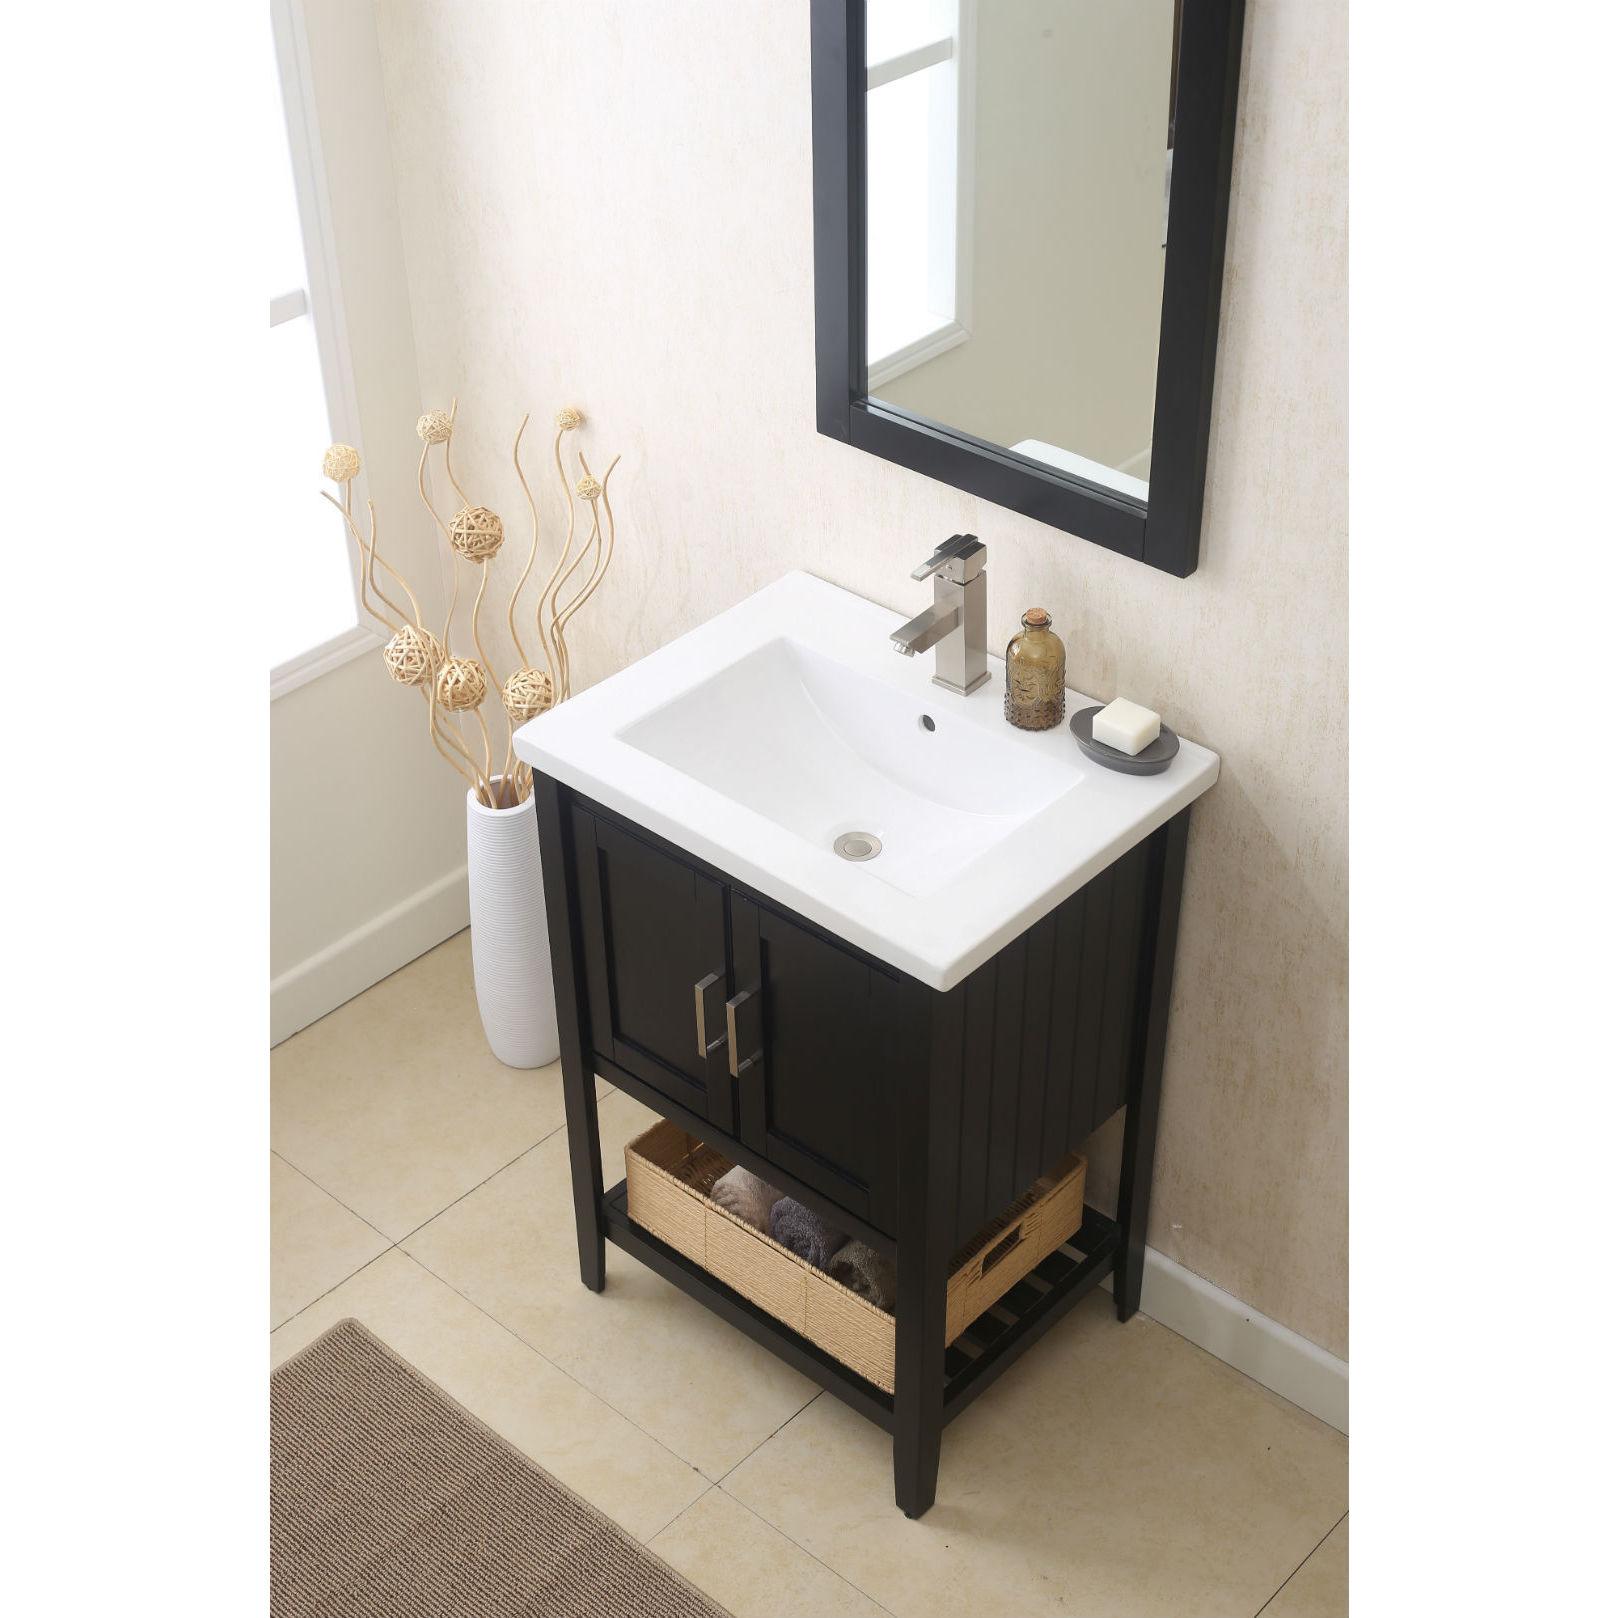 24 in. espresso bathroom vanity with single sink, Mirror, and faucet